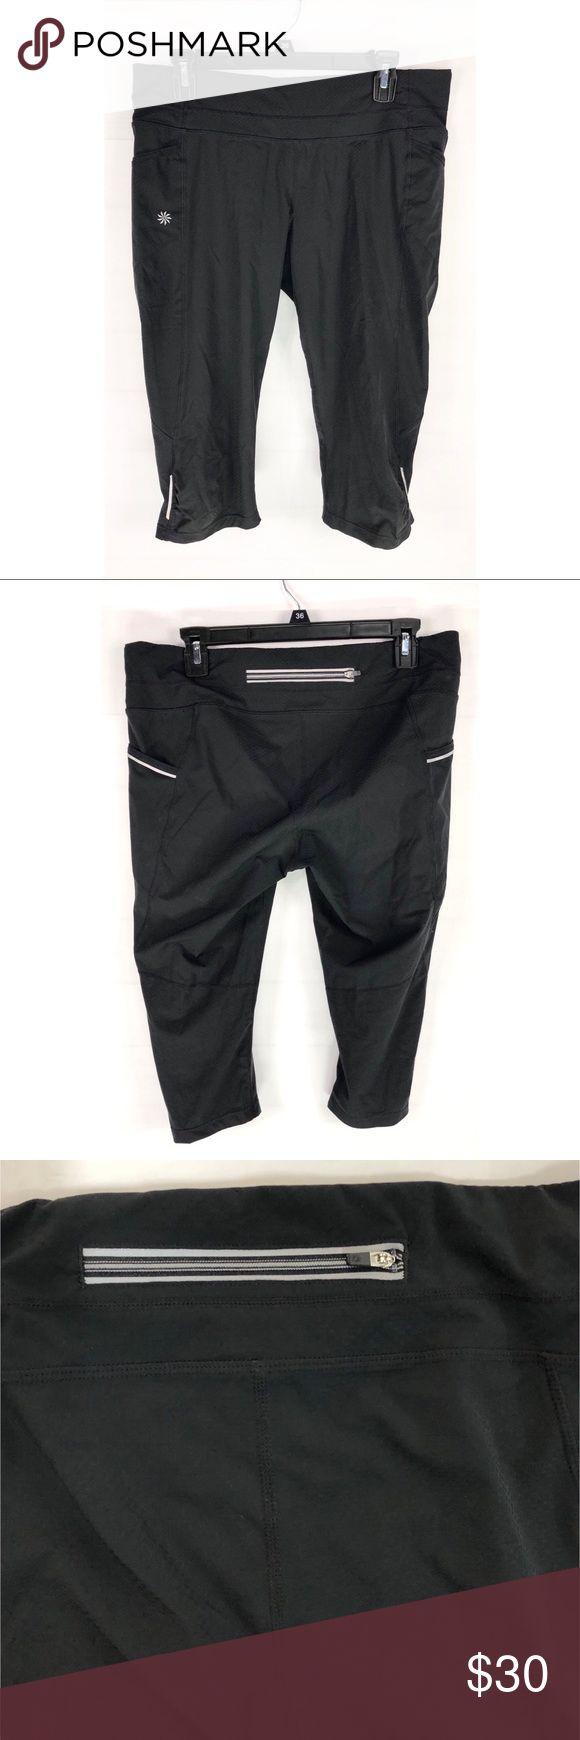 "Athleta Womens Capri Pants Black Ruched Side Lg Athleta Womens Capri Crop Pants Size Large Black Ruched, Side & Back Pockets   • Waist: 16"" • Inseam: 16.5"" • Leg opening: 6.5""  B43 Athleta Pants Capris"